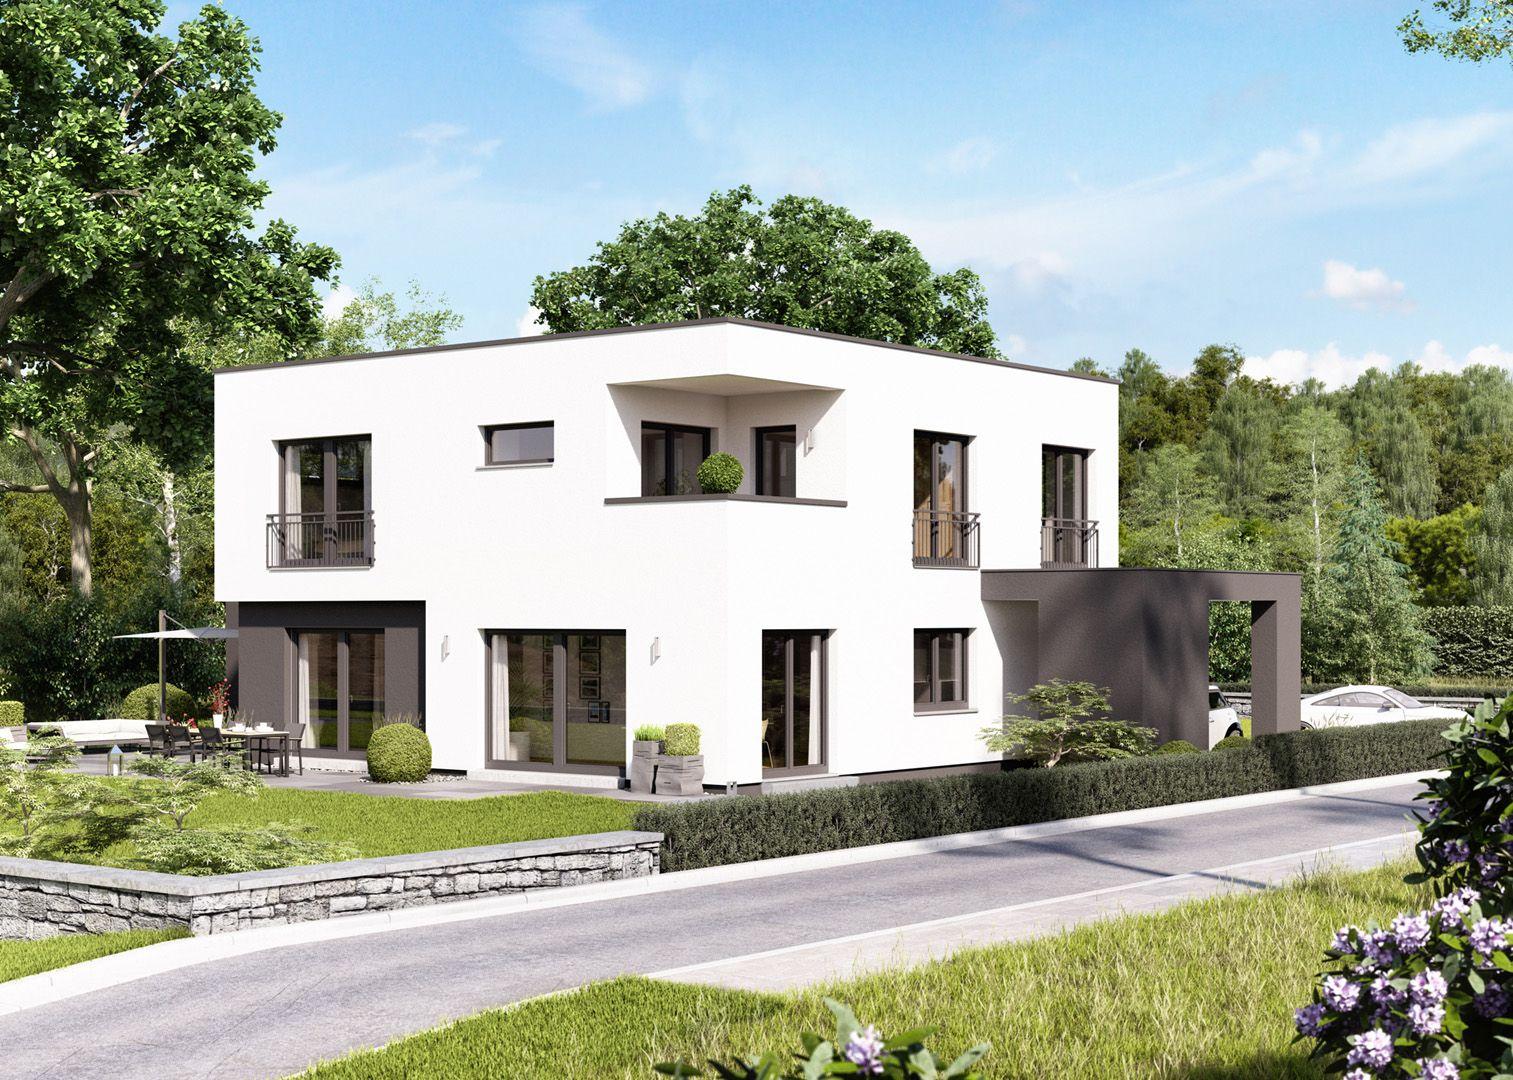 Villa treppenhaus modern  Cube 10 I Flachdach I massa haus 😁💚 #Lifestyle #Baufamilien ...